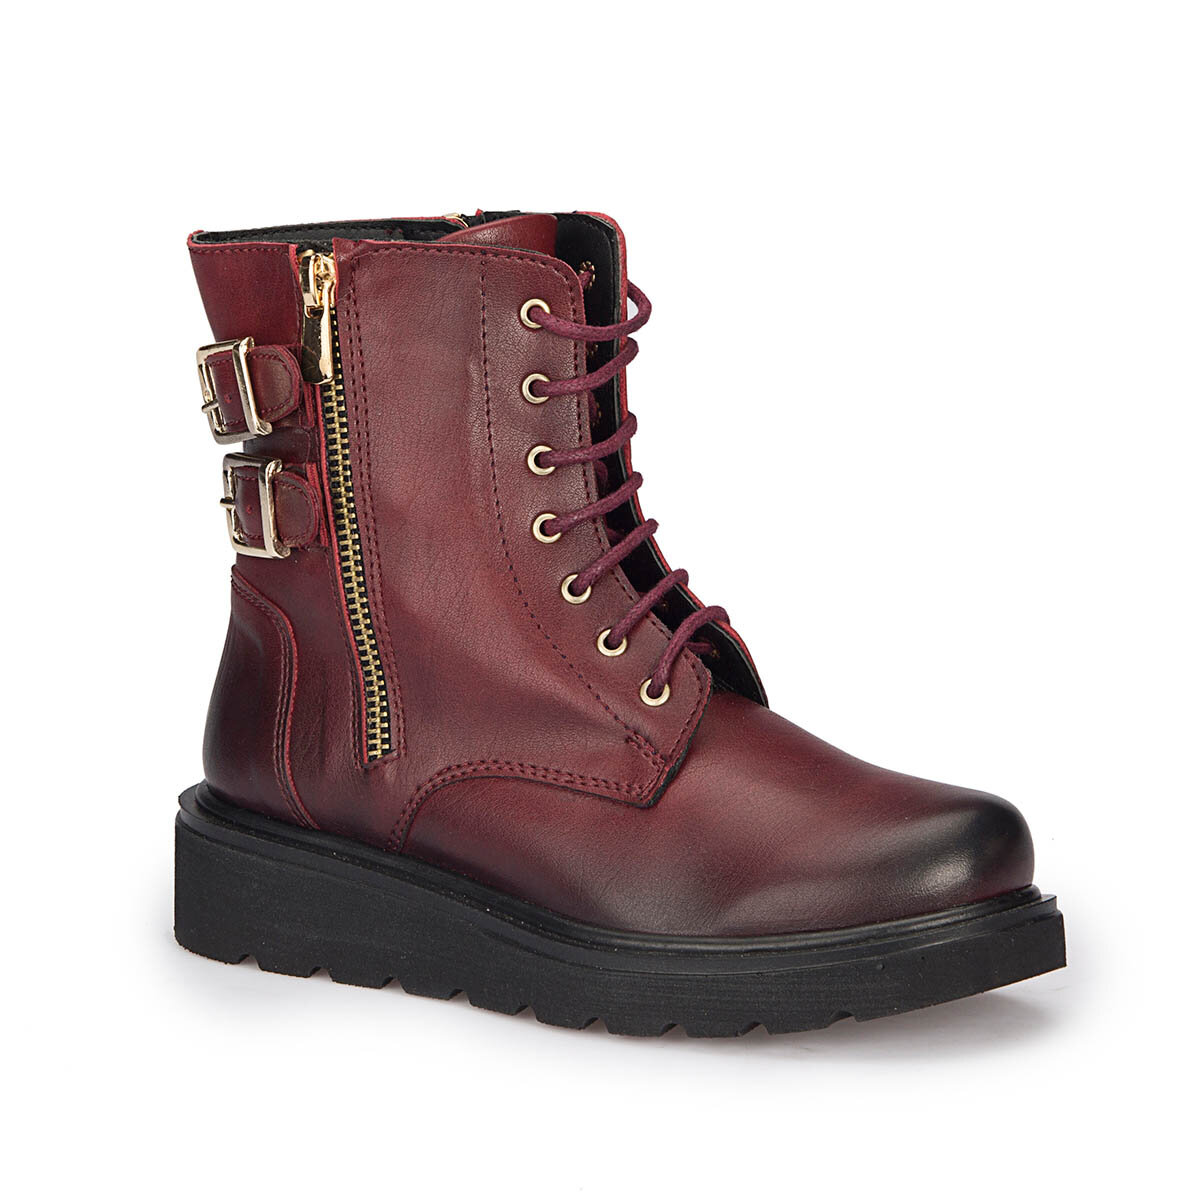 FLO 72.509673.F Burgundy Female Child Boots Polaris